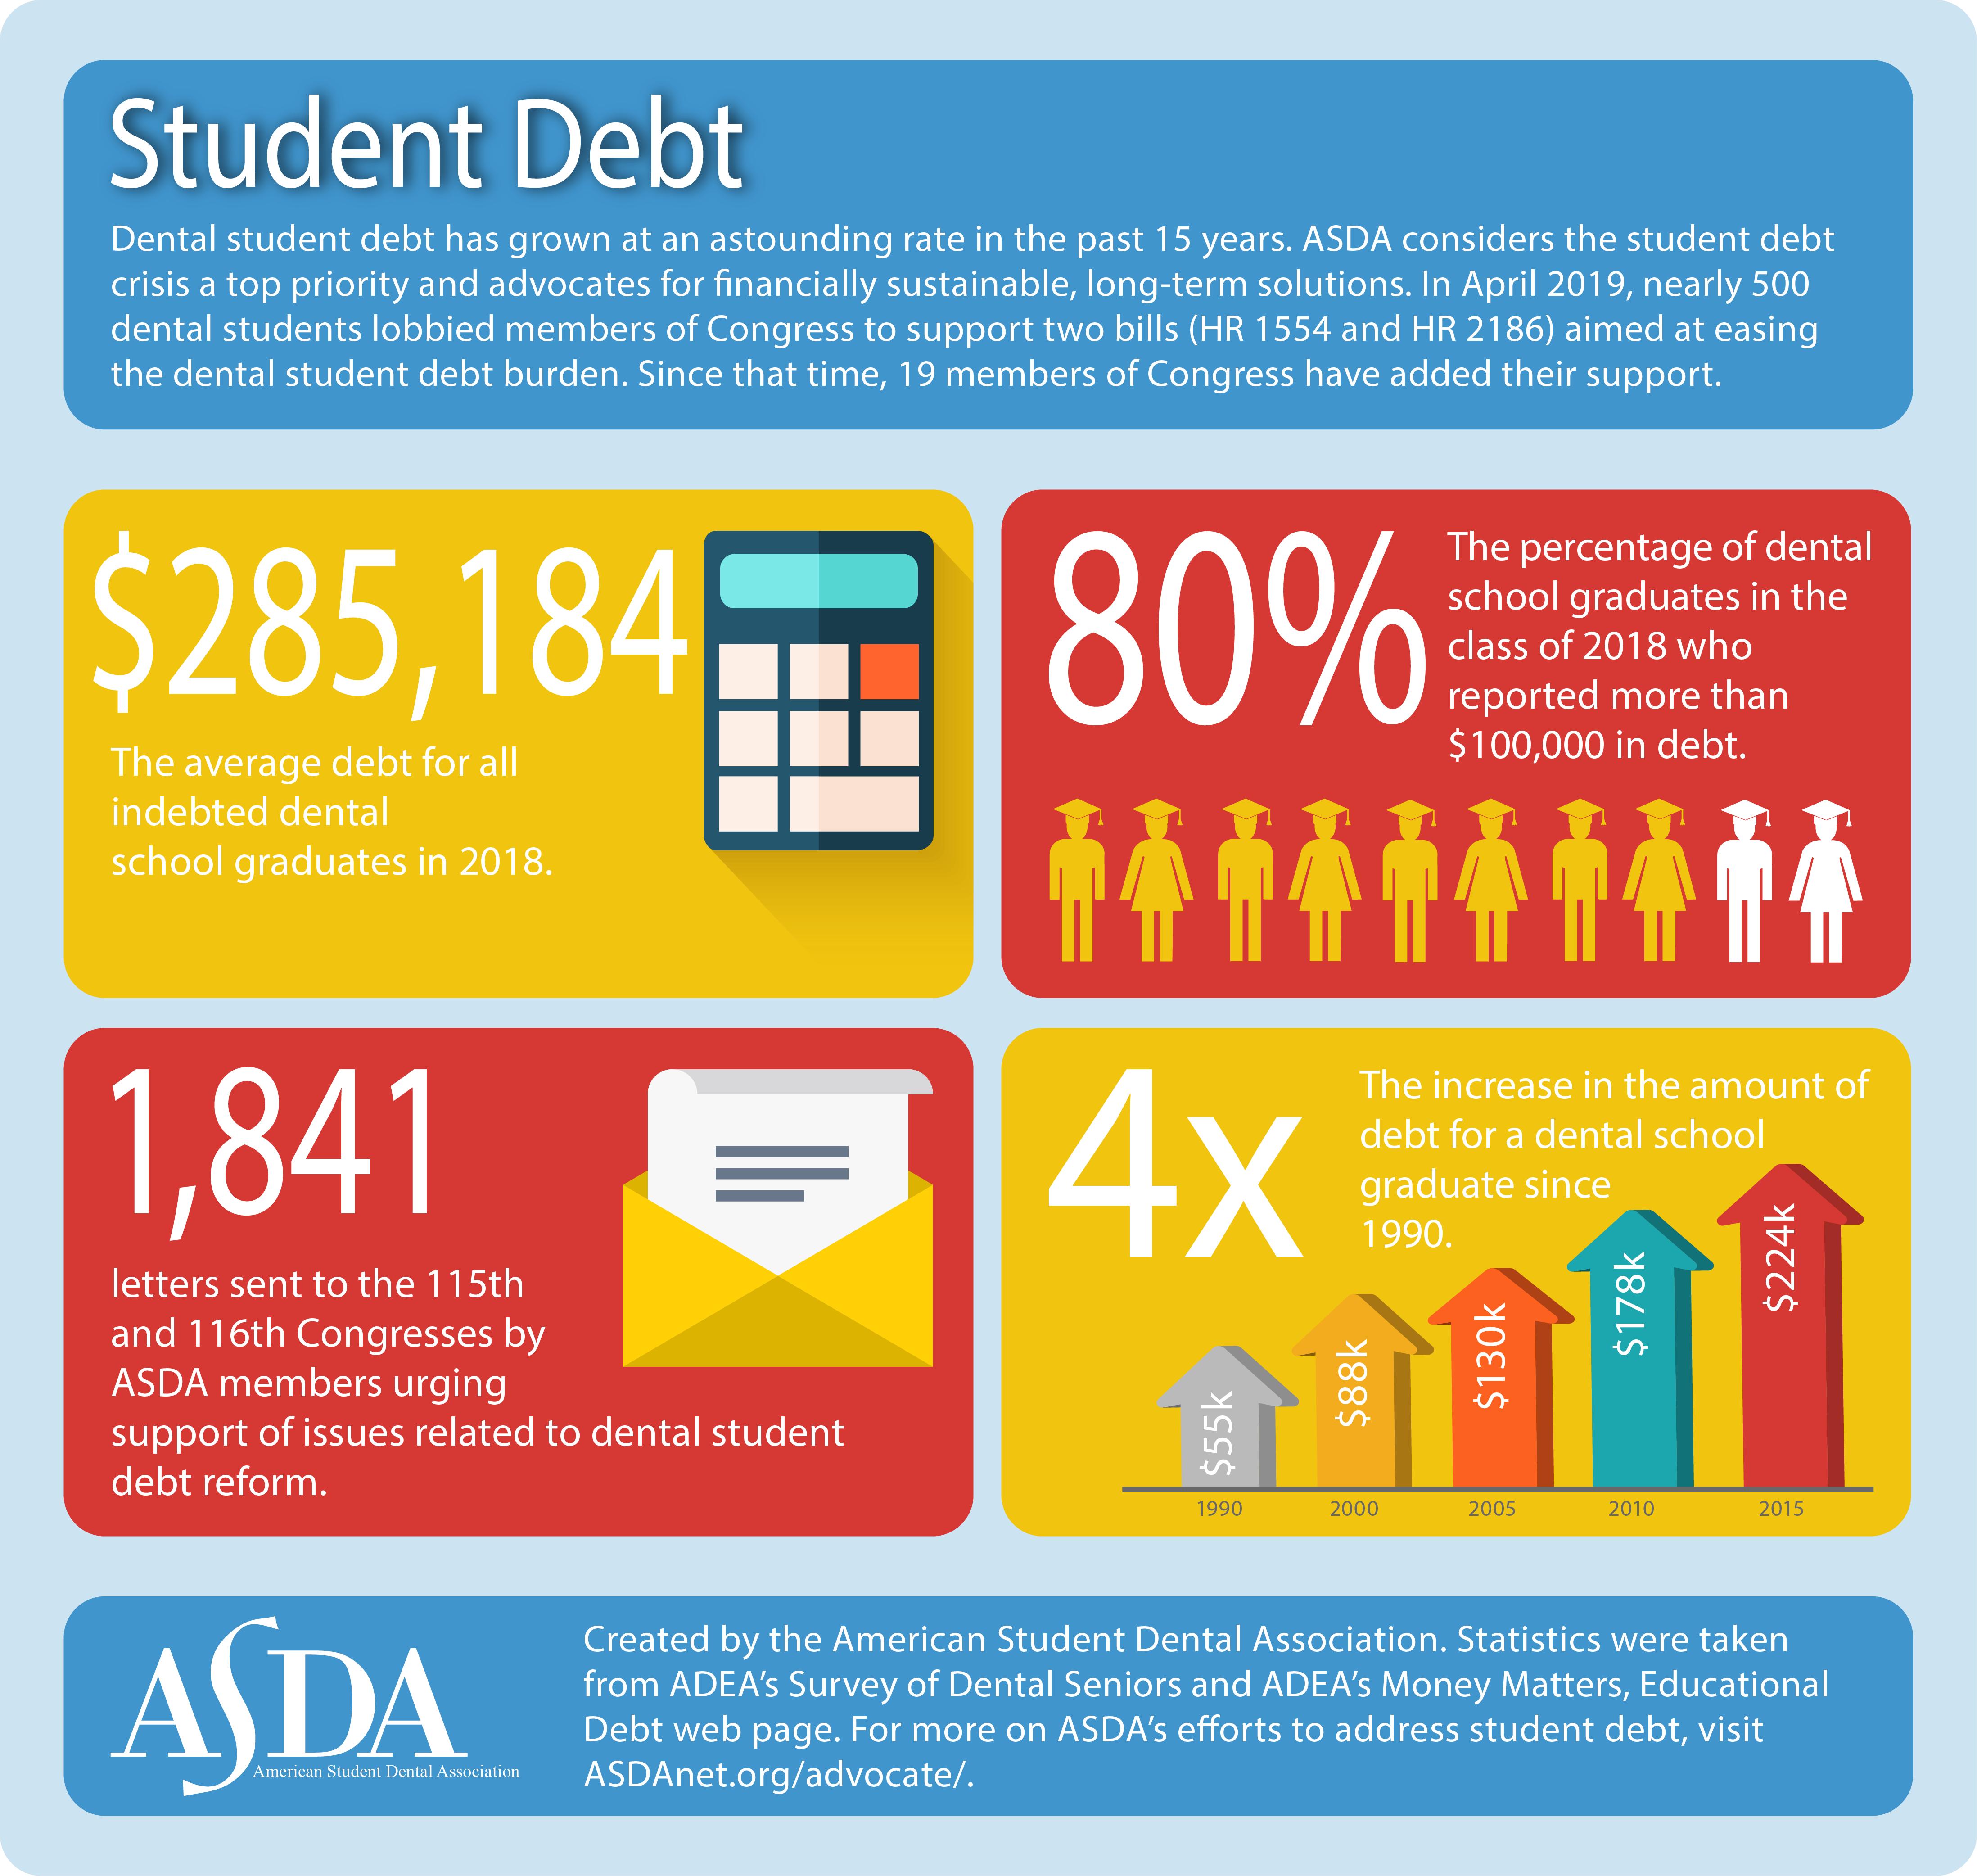 studentdebt_infographic_12 12 17_web